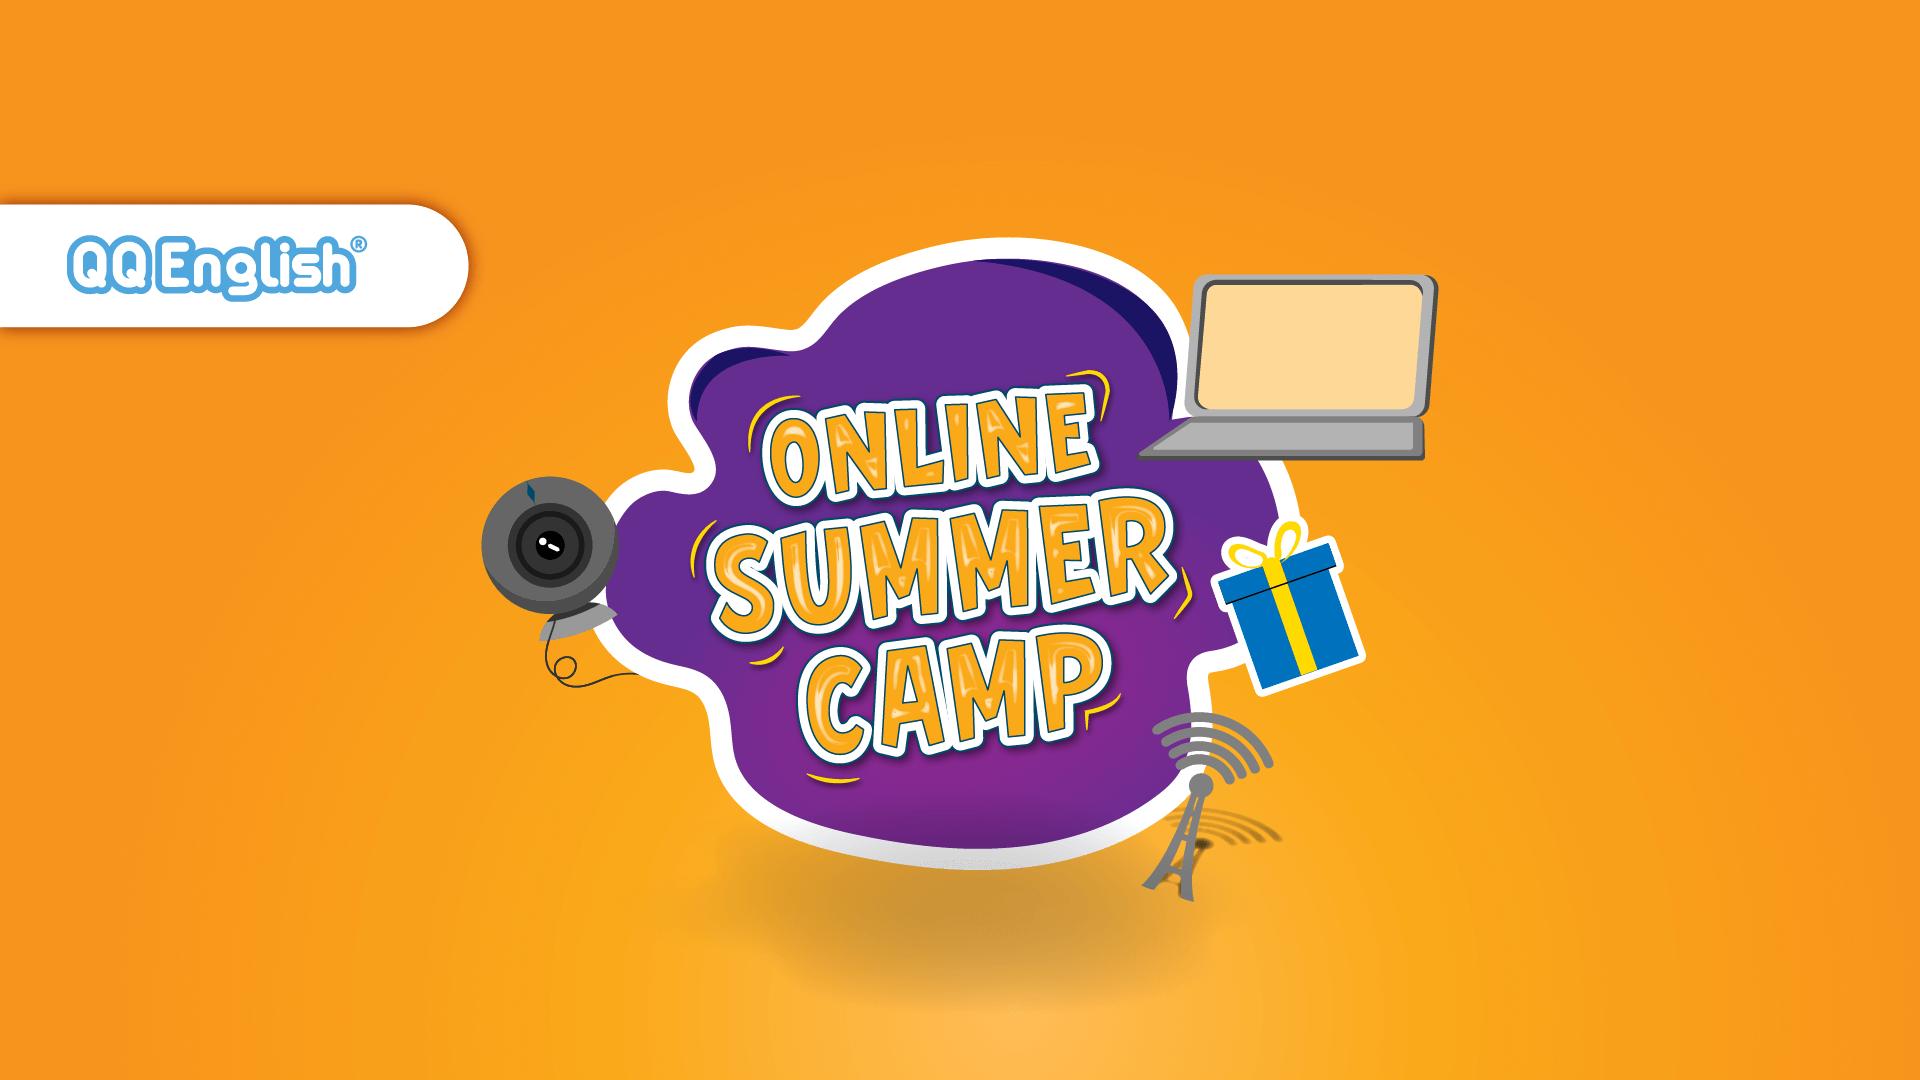 English (ESL) Summer Camp Program for Children and Teens